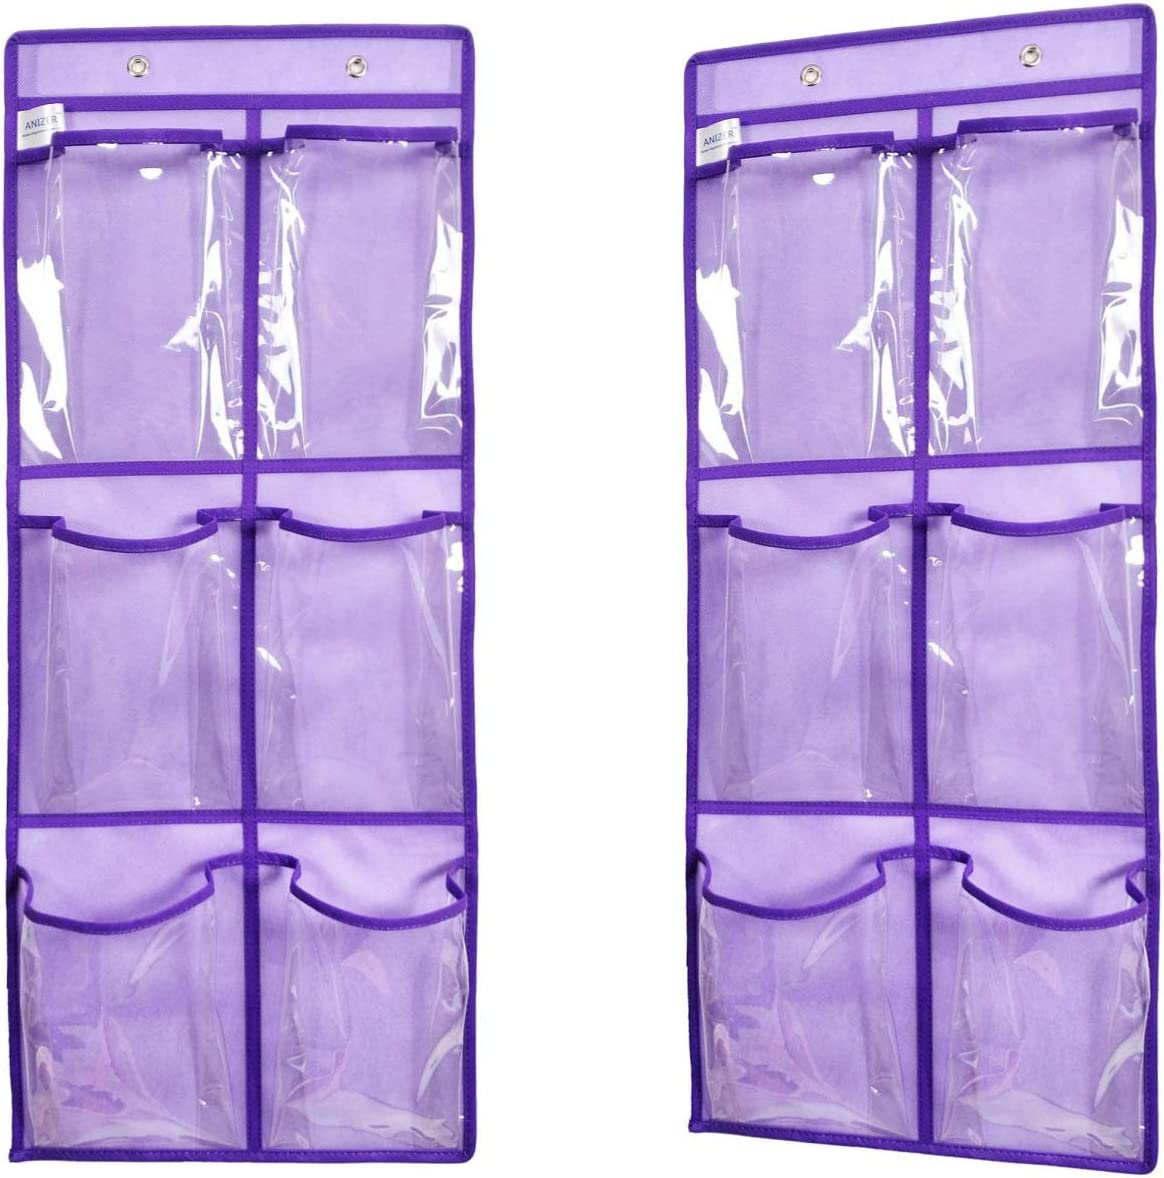 ANIZER Over The Door Hanging Shoe Organizer Narrow Closet Door Shoe Storage 6 Large Clear Pockets Chart 2 Pack (Purple)